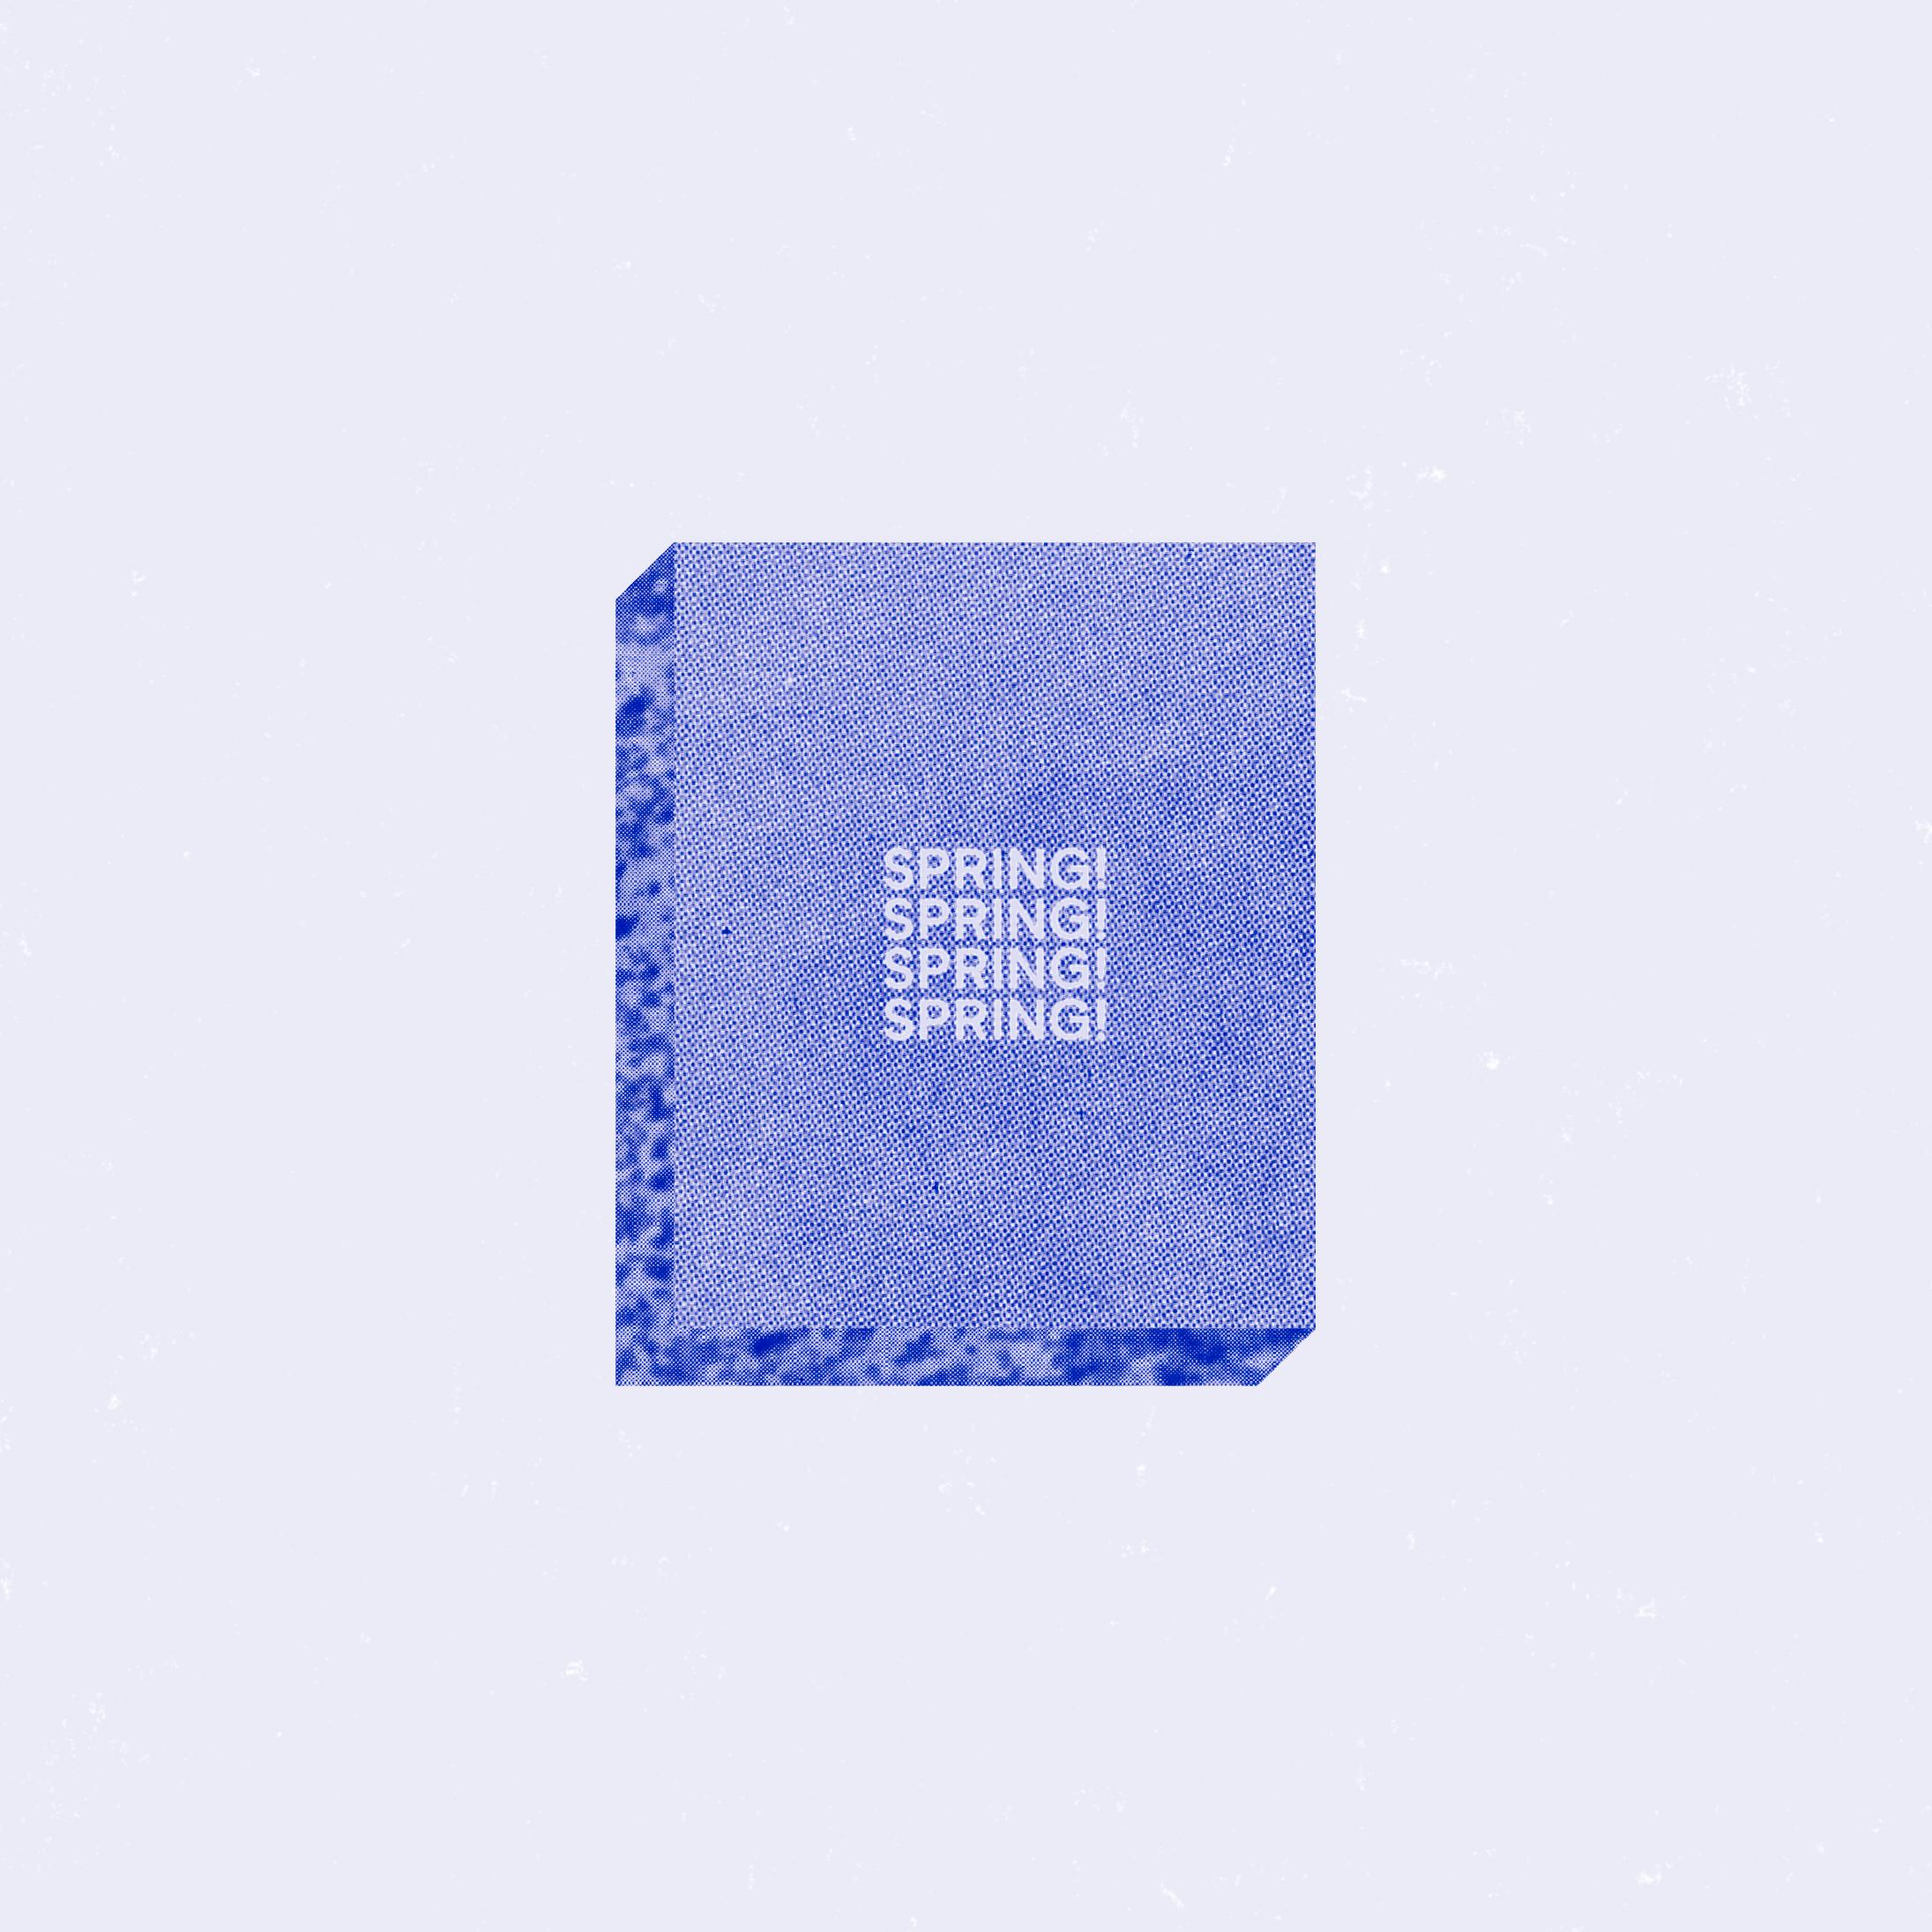 springopenings-03.png